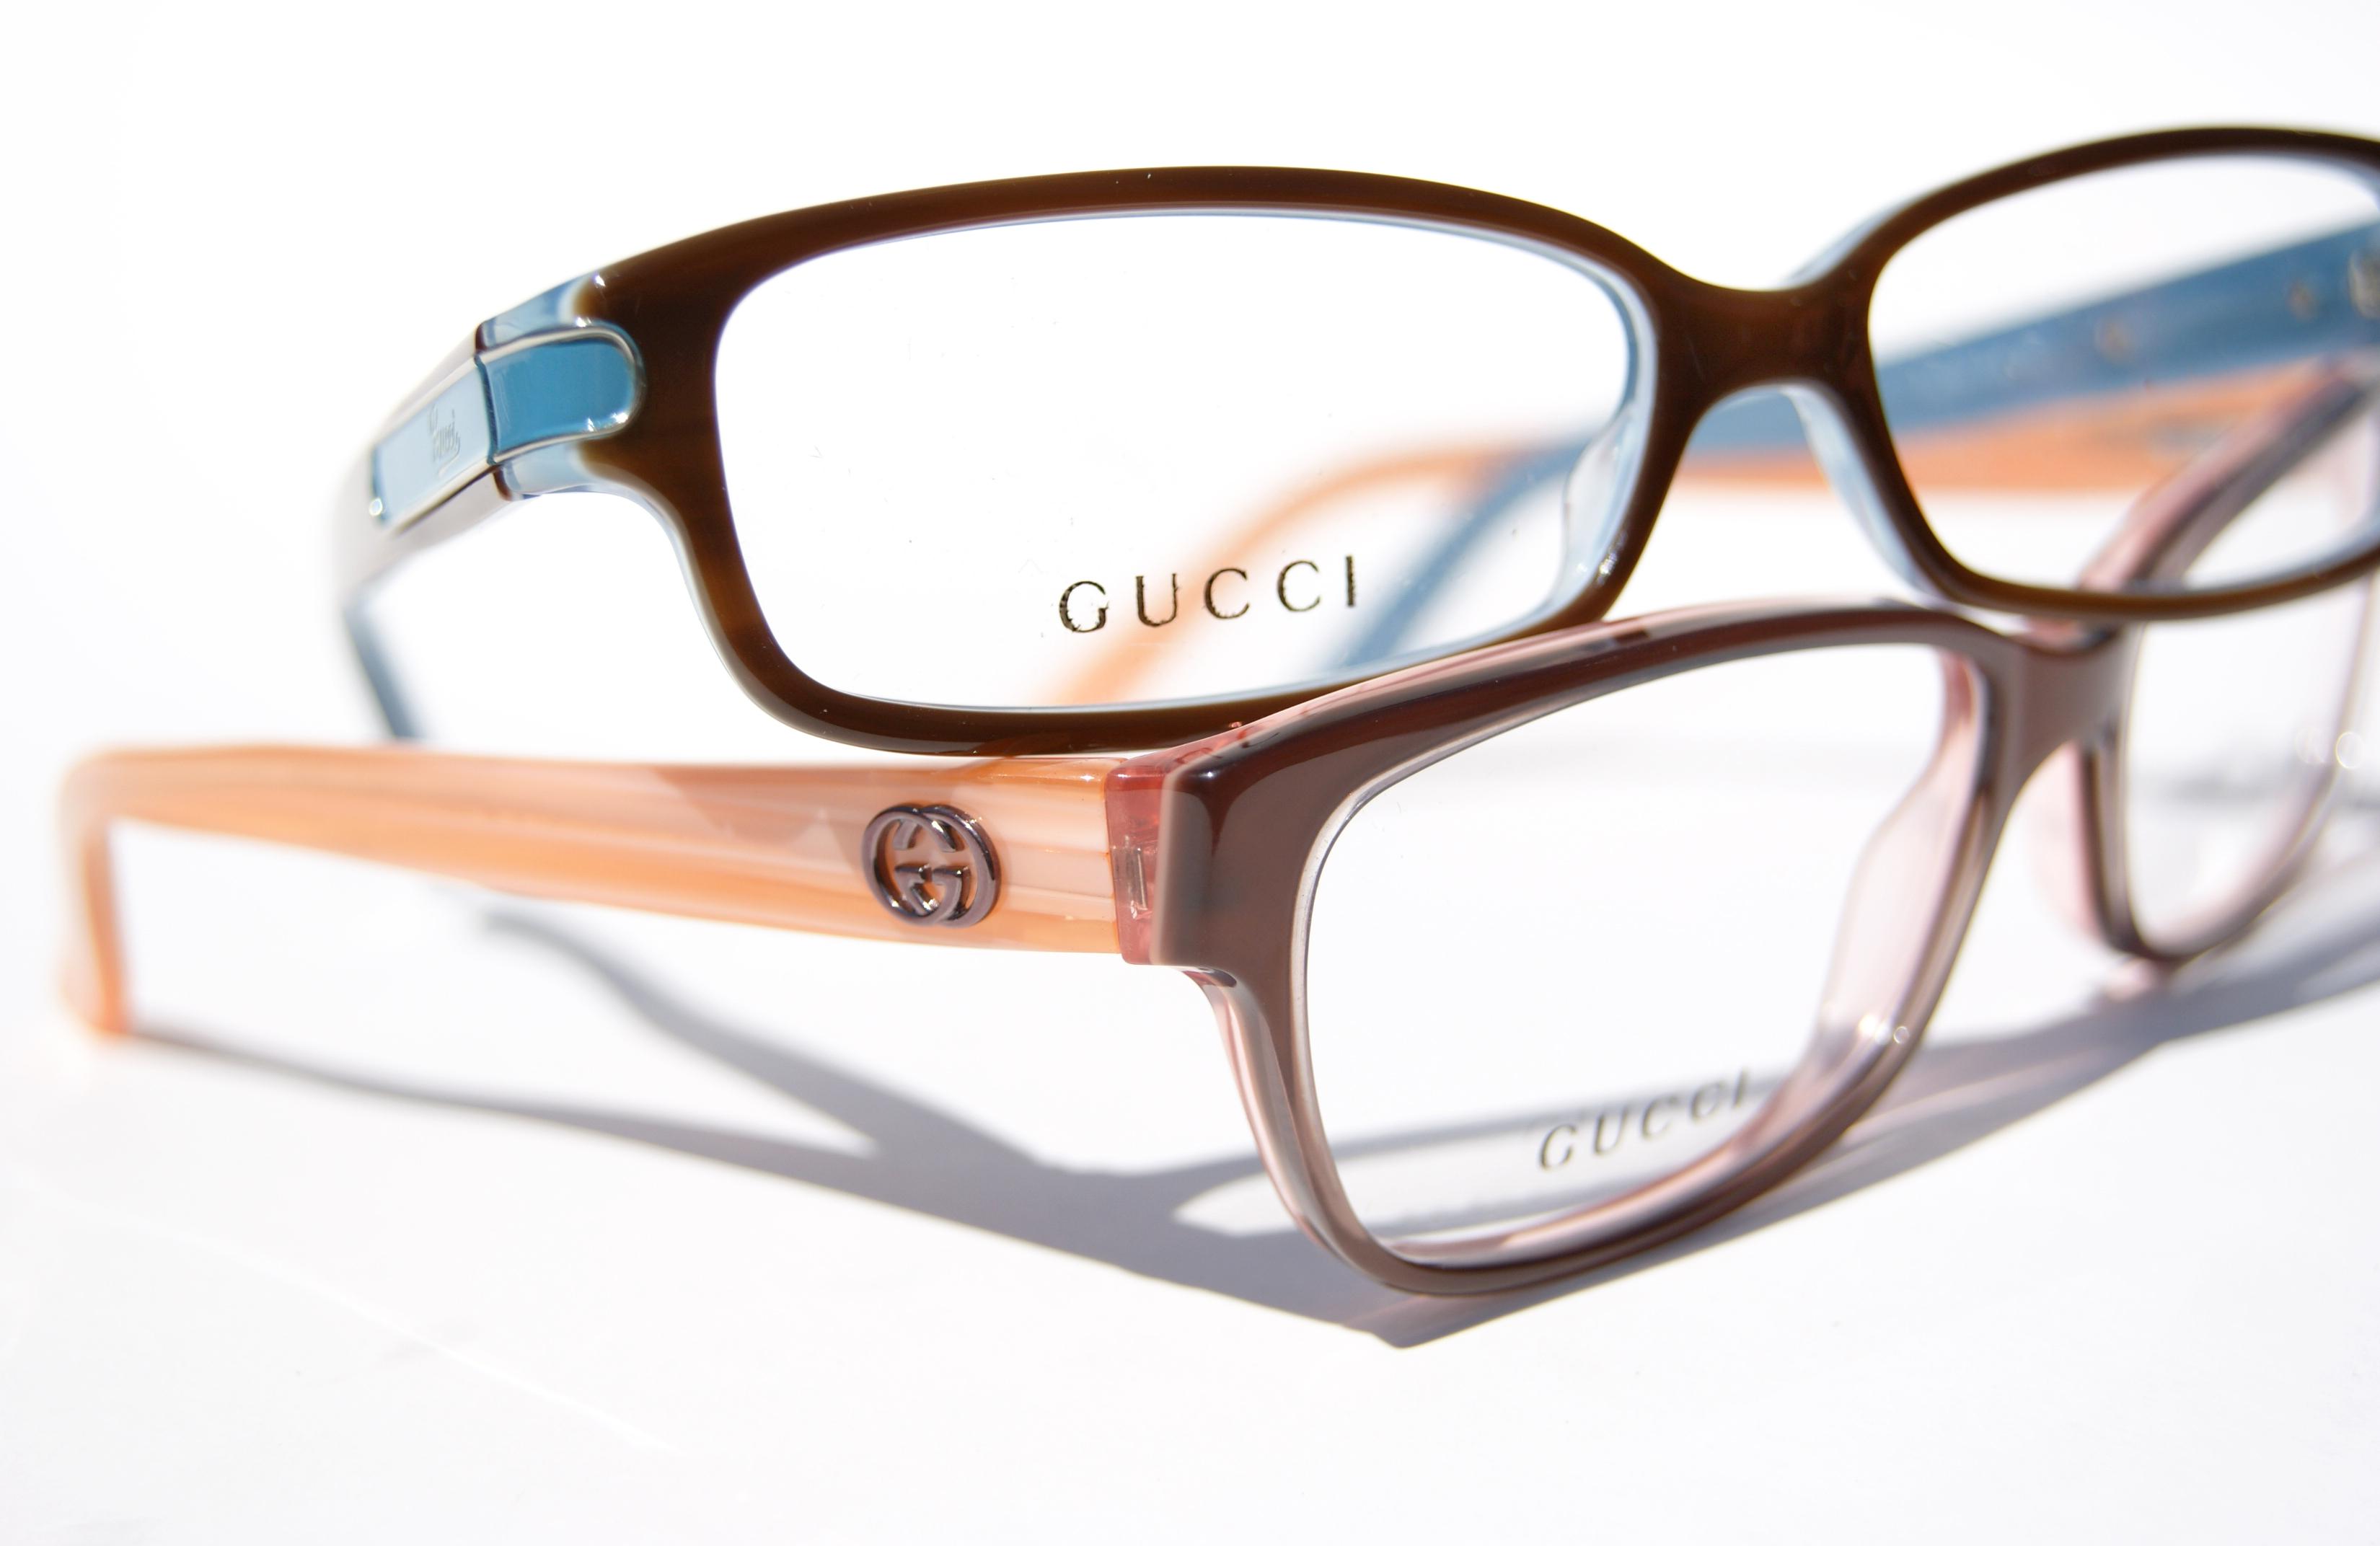 Gucci Eyewear 2012 Exquisite Innovation Haddonfield ...